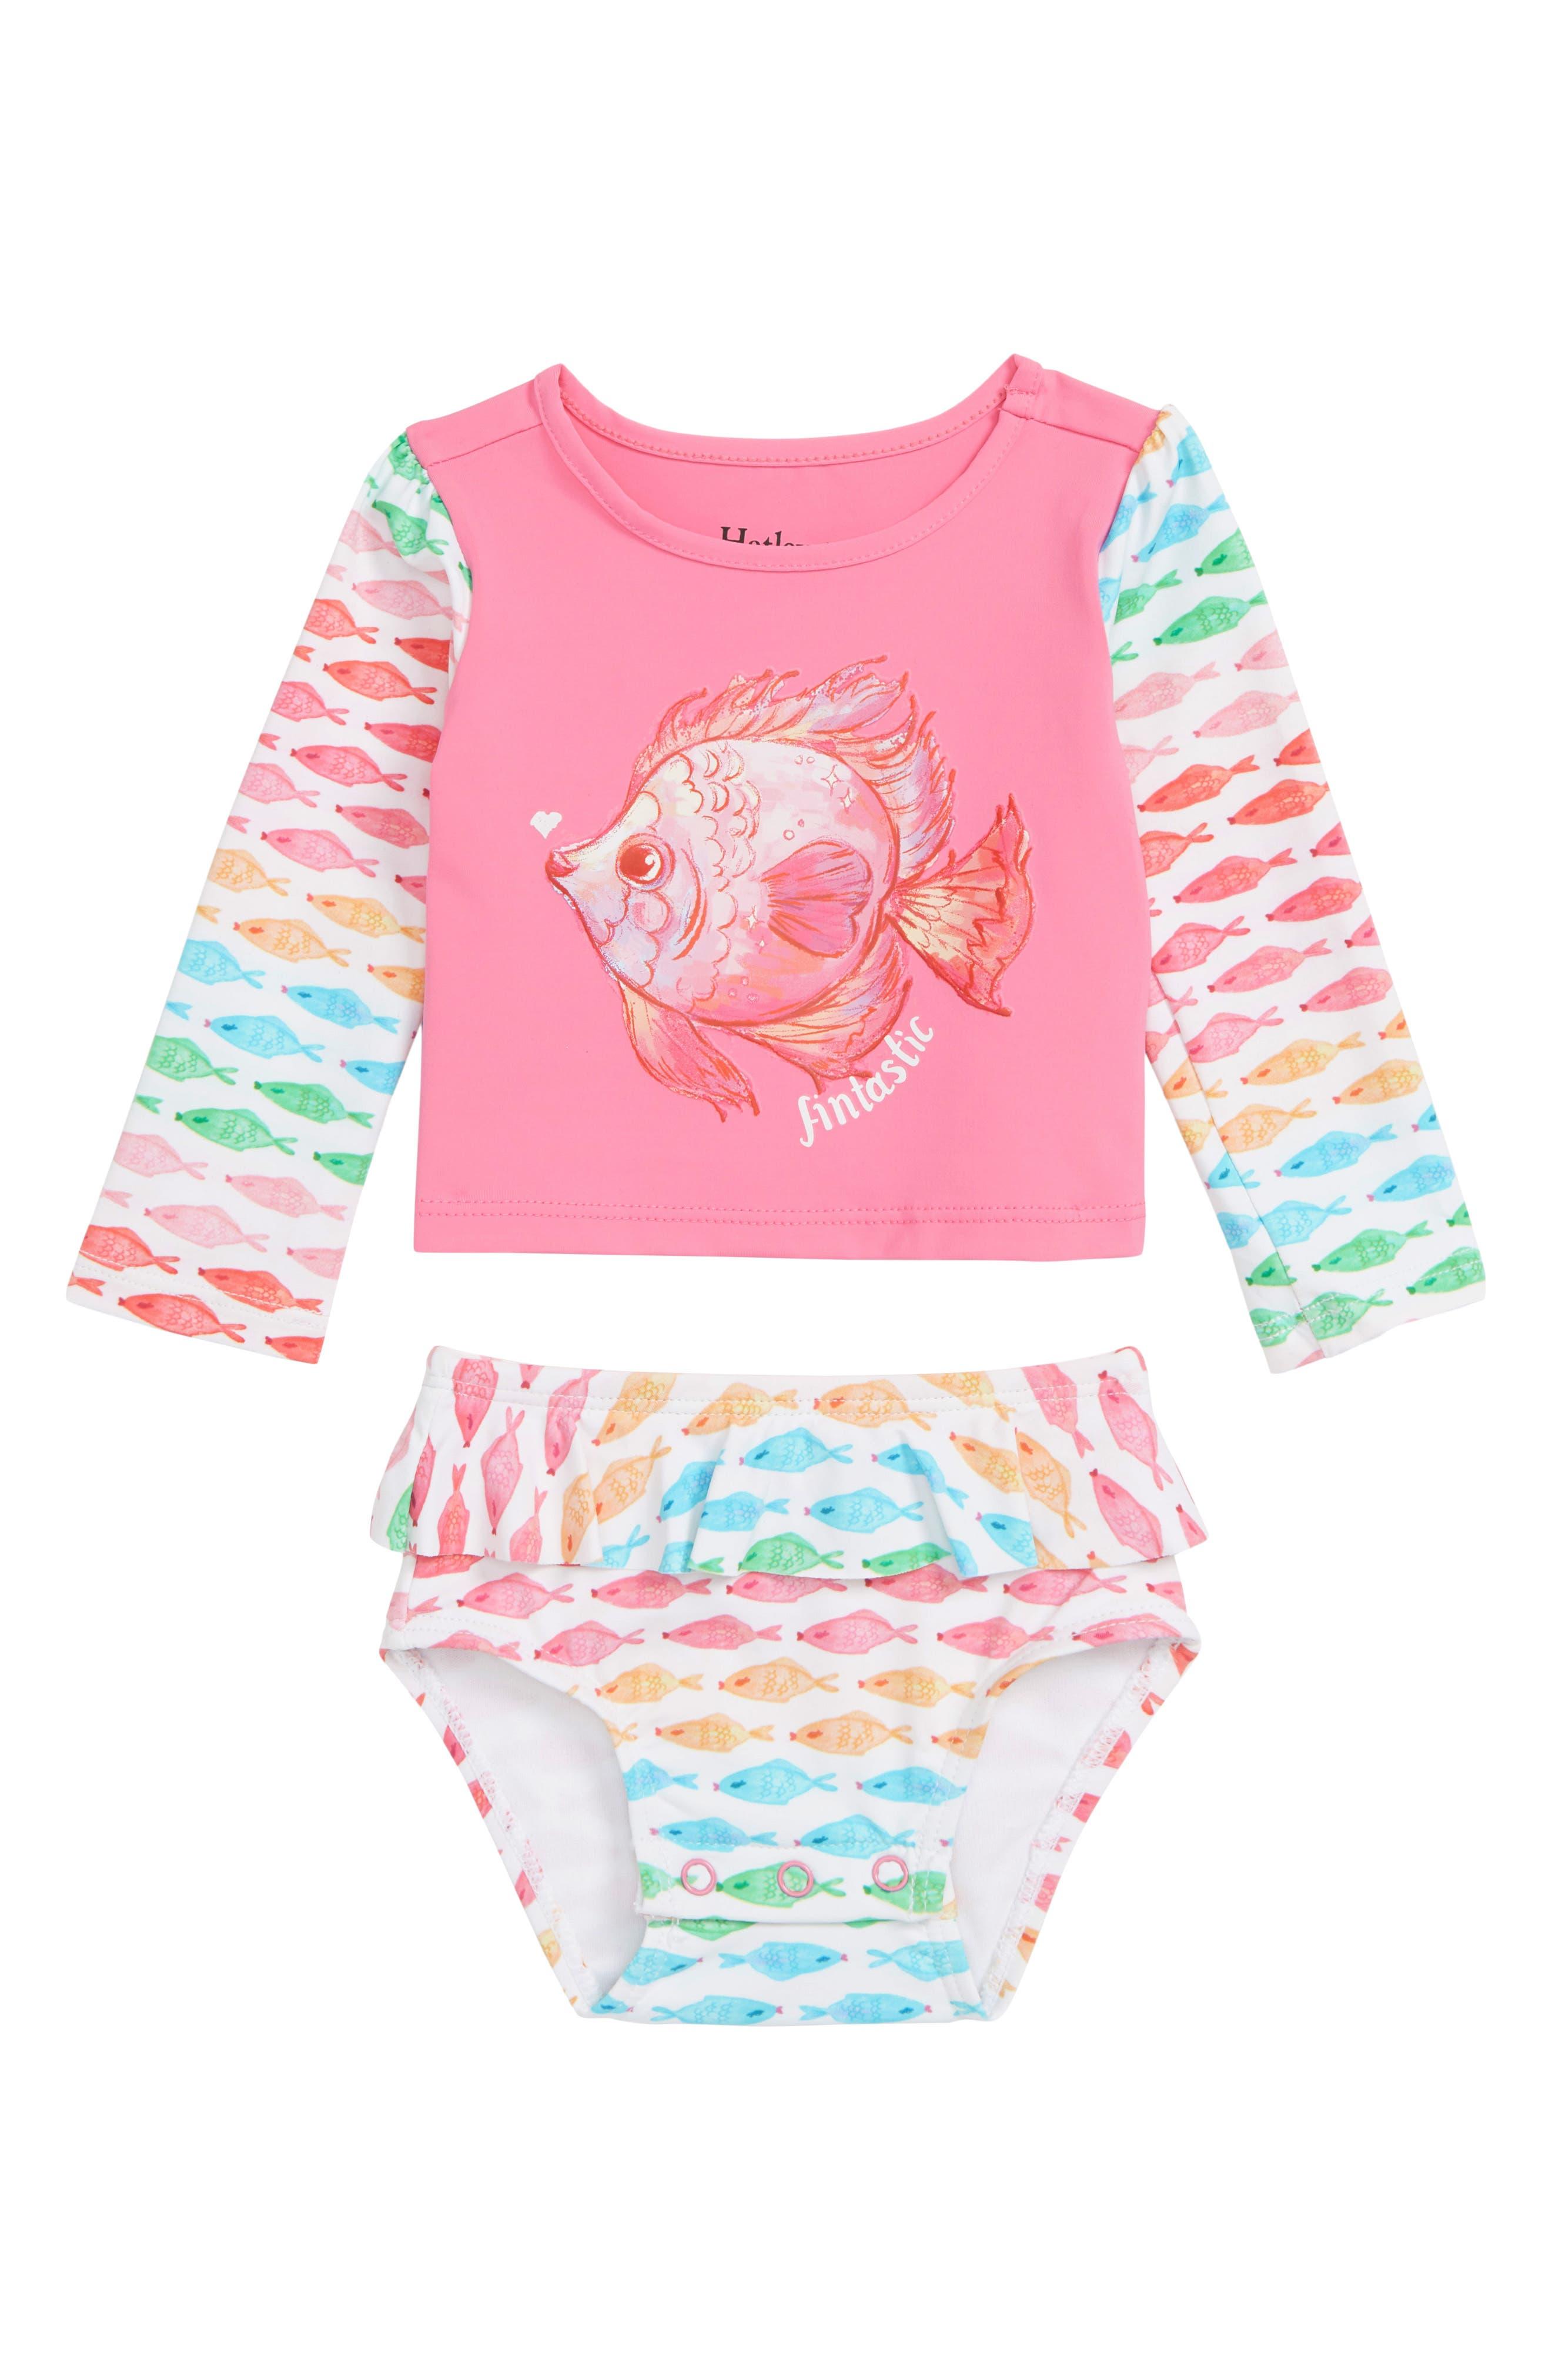 HATLEY Watercolor Fishies Two-Piece Rashguard Swimsuit, Main, color, PINK